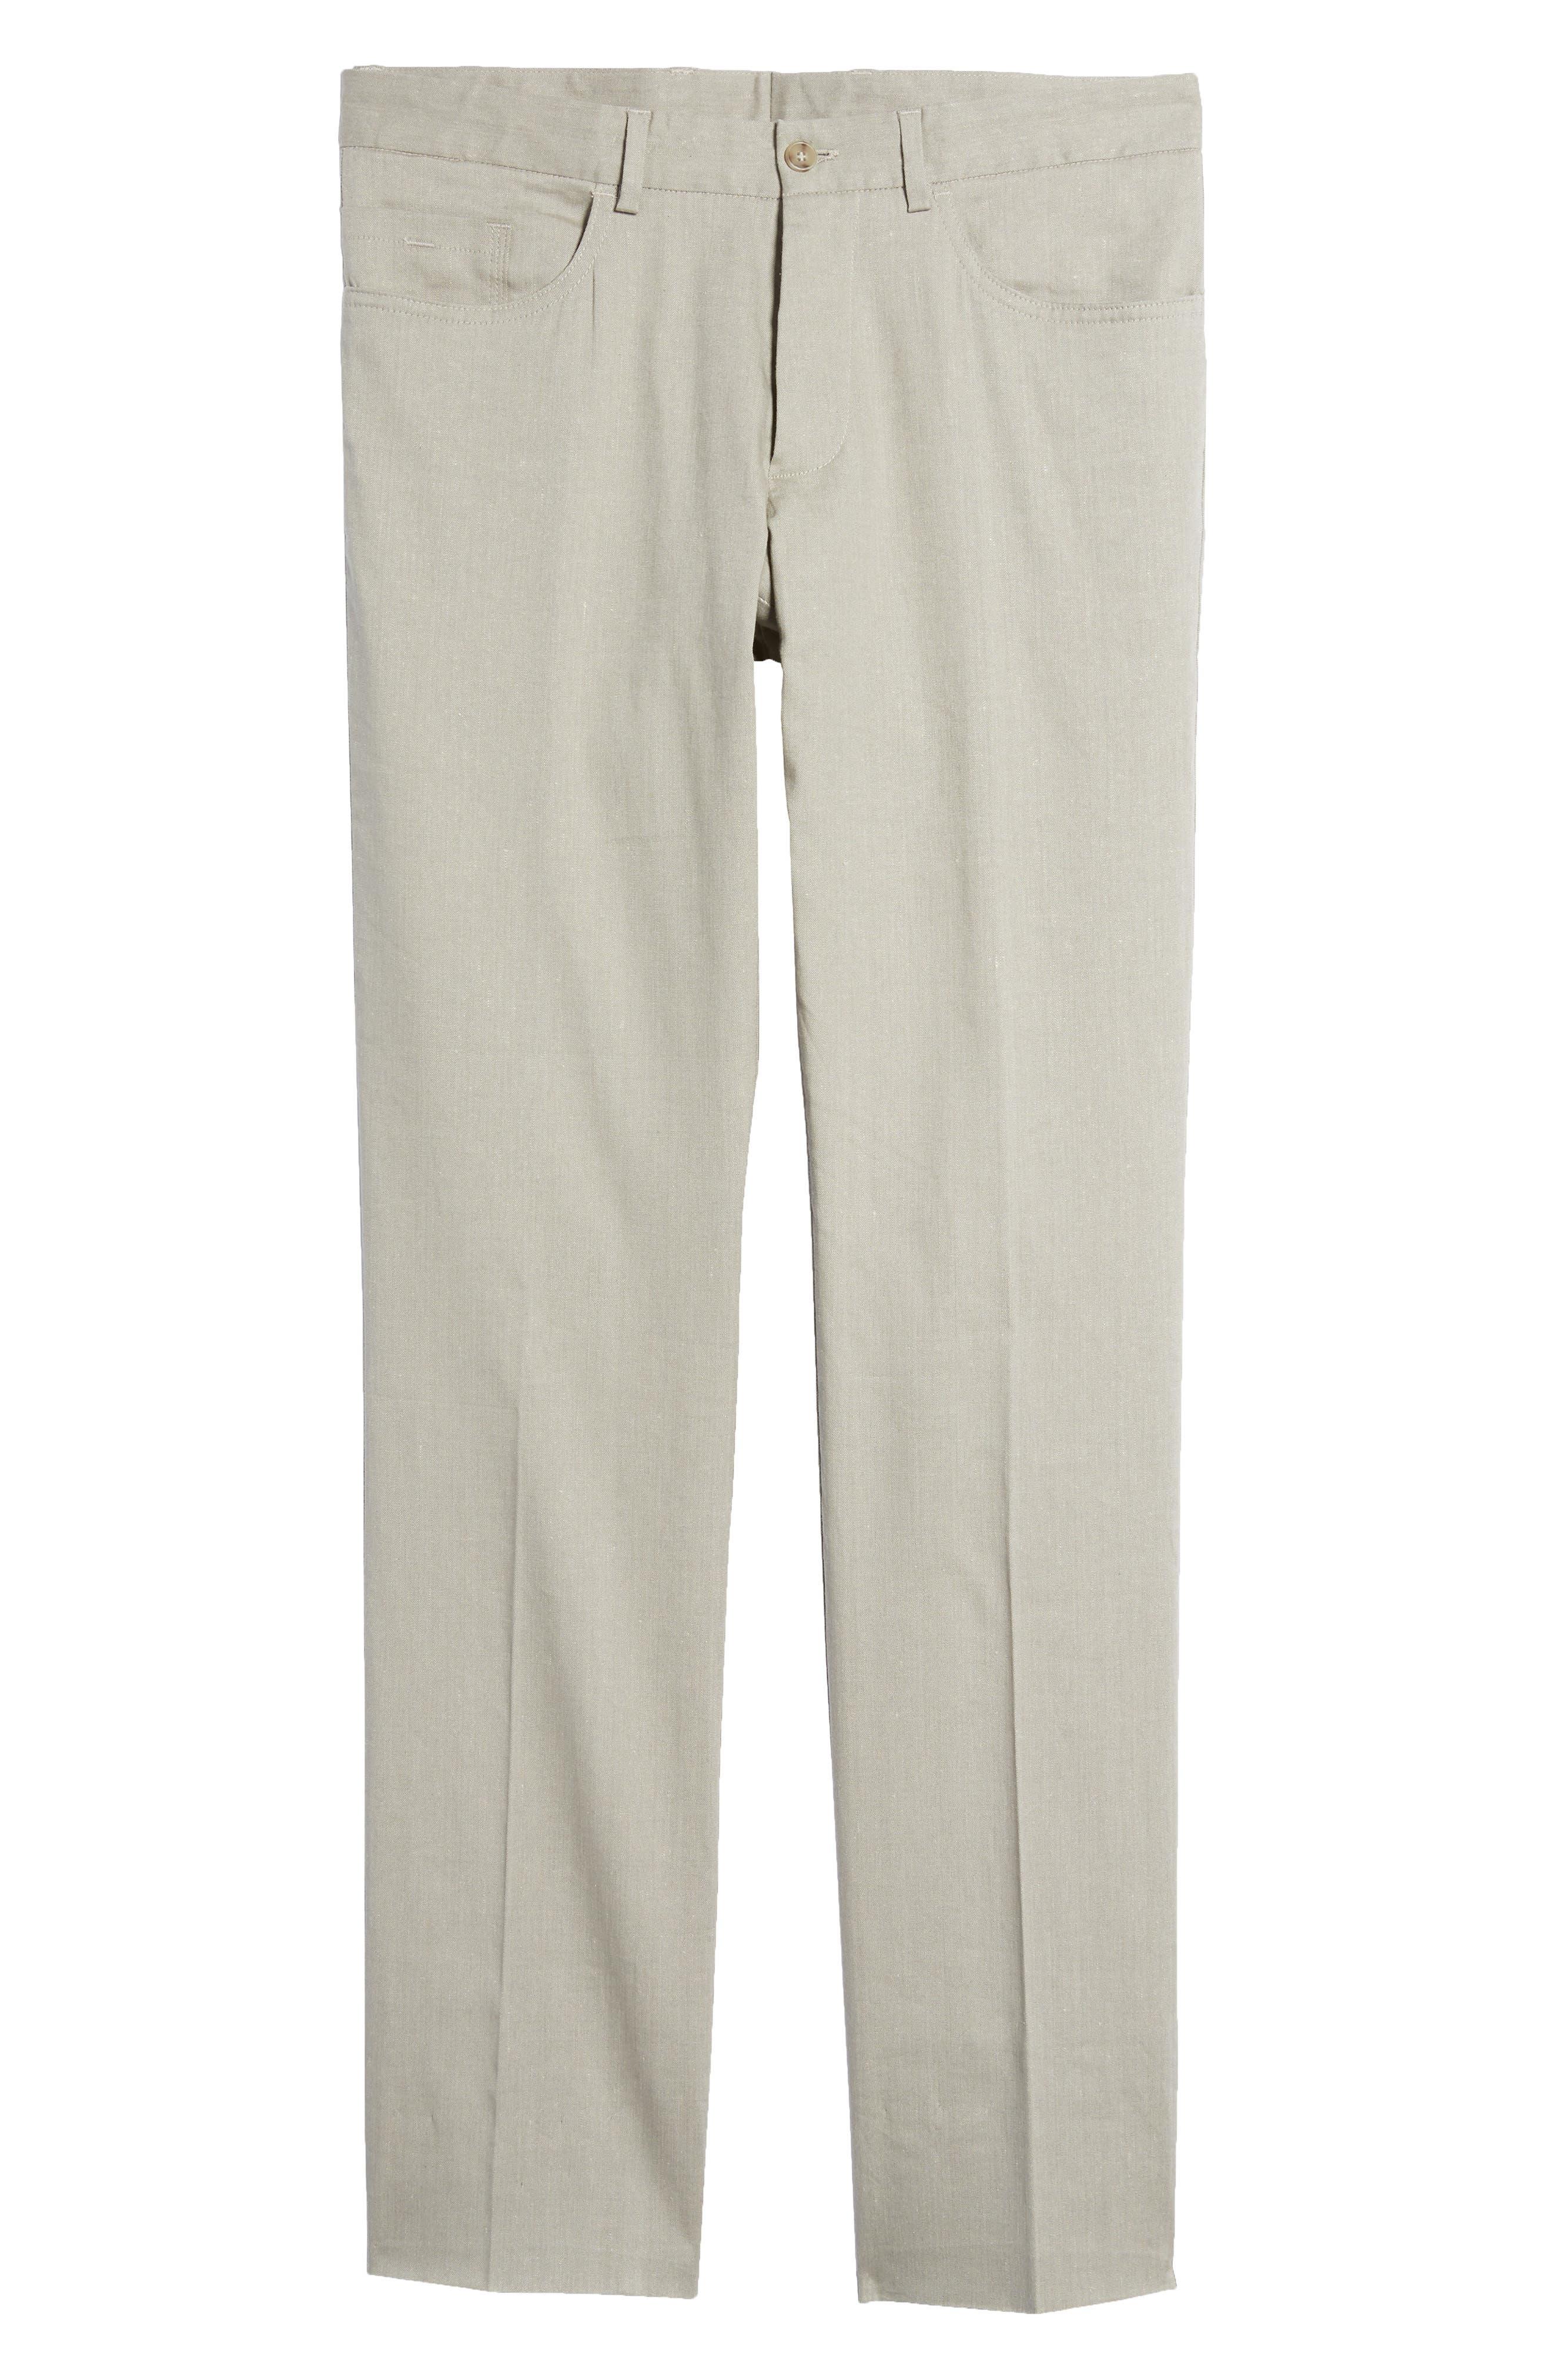 Flat Front Stretch Linen & Cotton Trousers,                             Alternate thumbnail 6, color,                             050